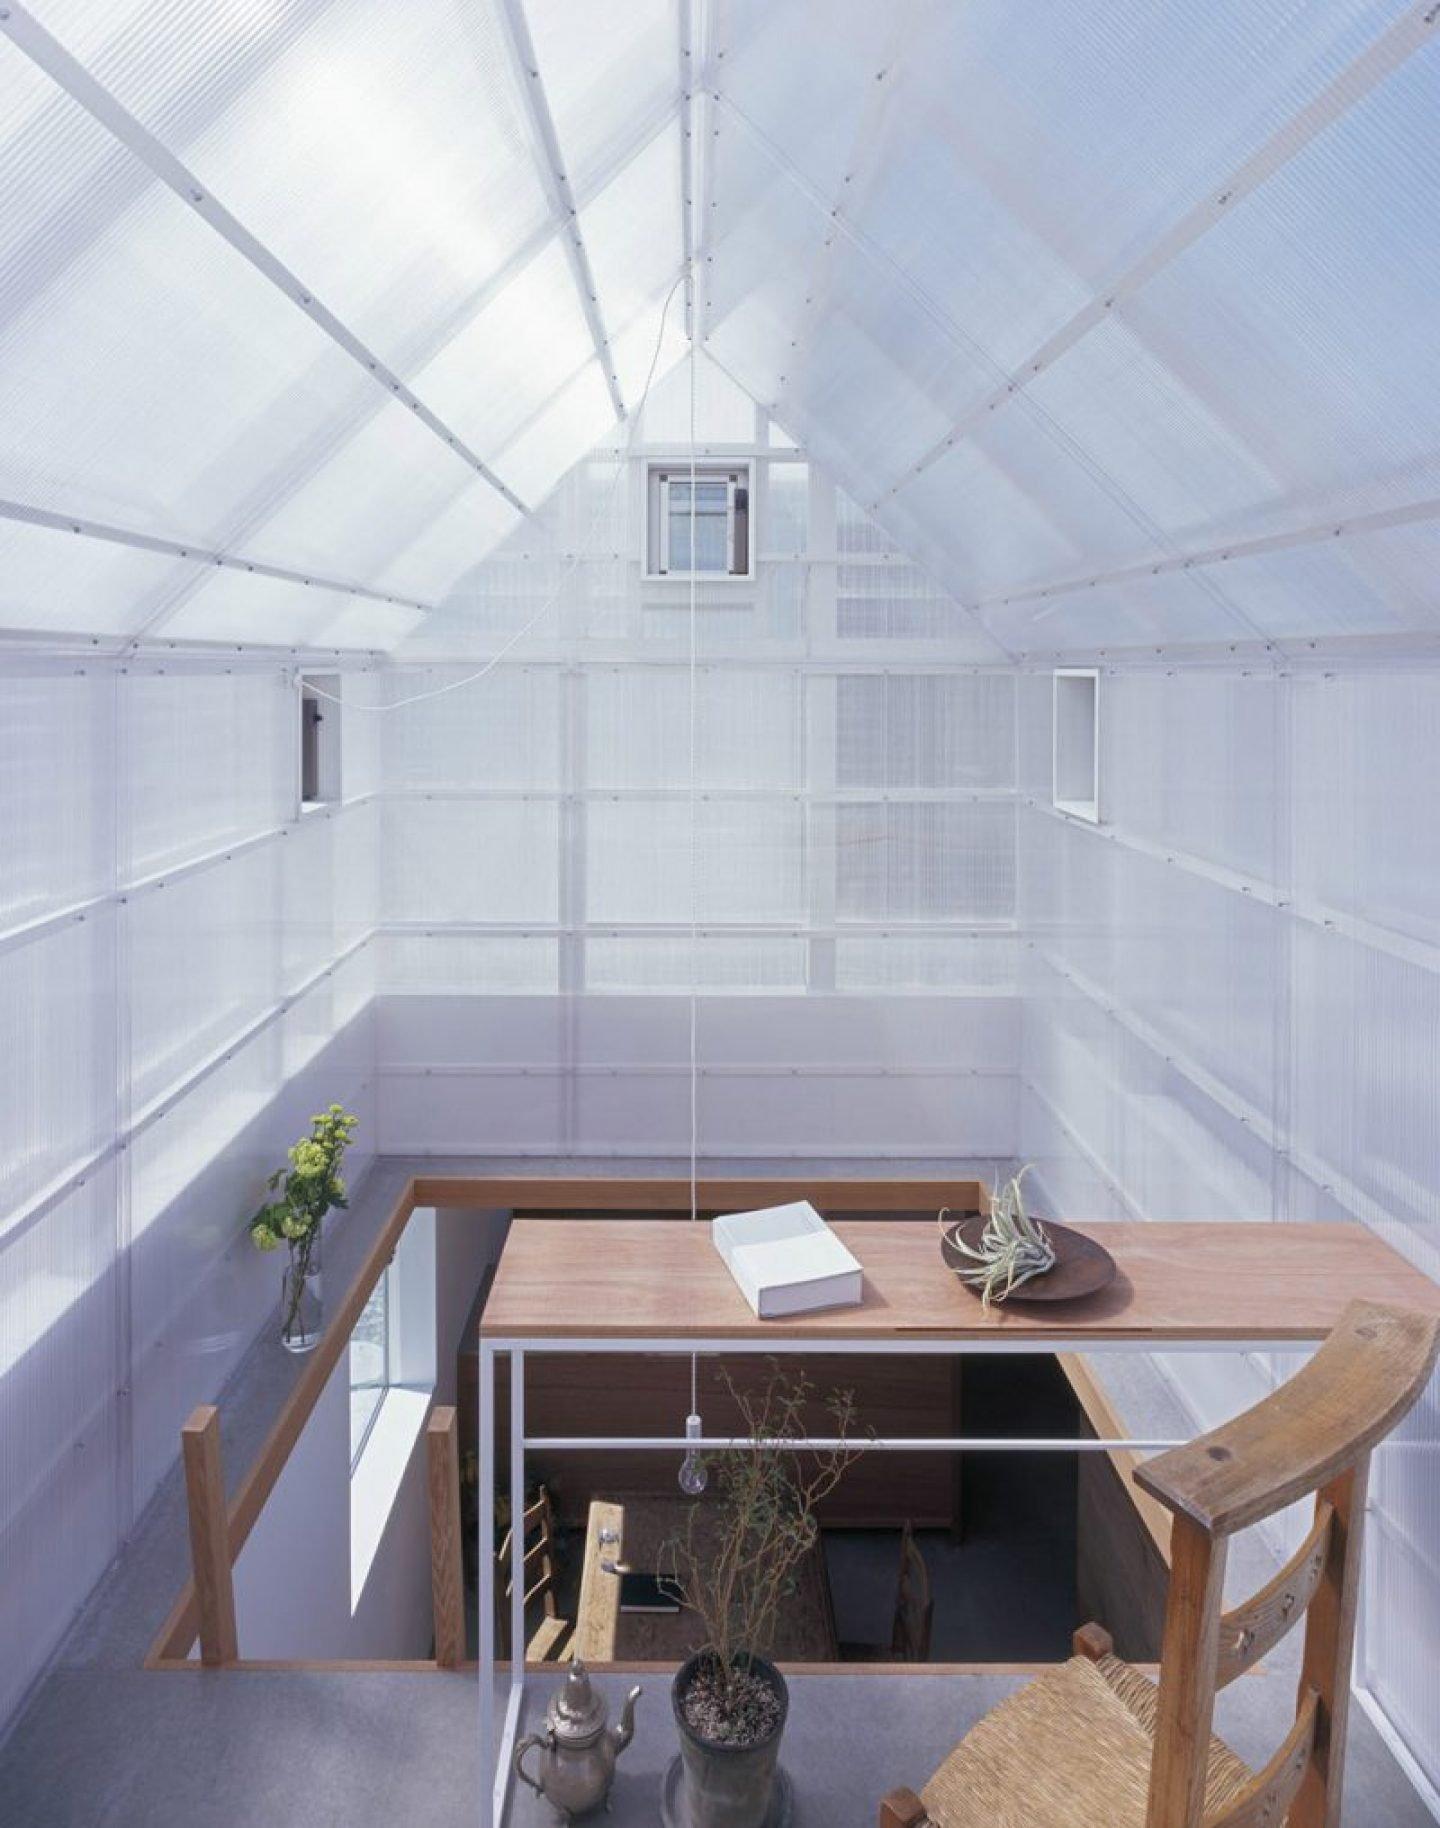 iGNANT_Architecture_Tato_Architects_Yo_Shimada_House_In_Yamasaki_14